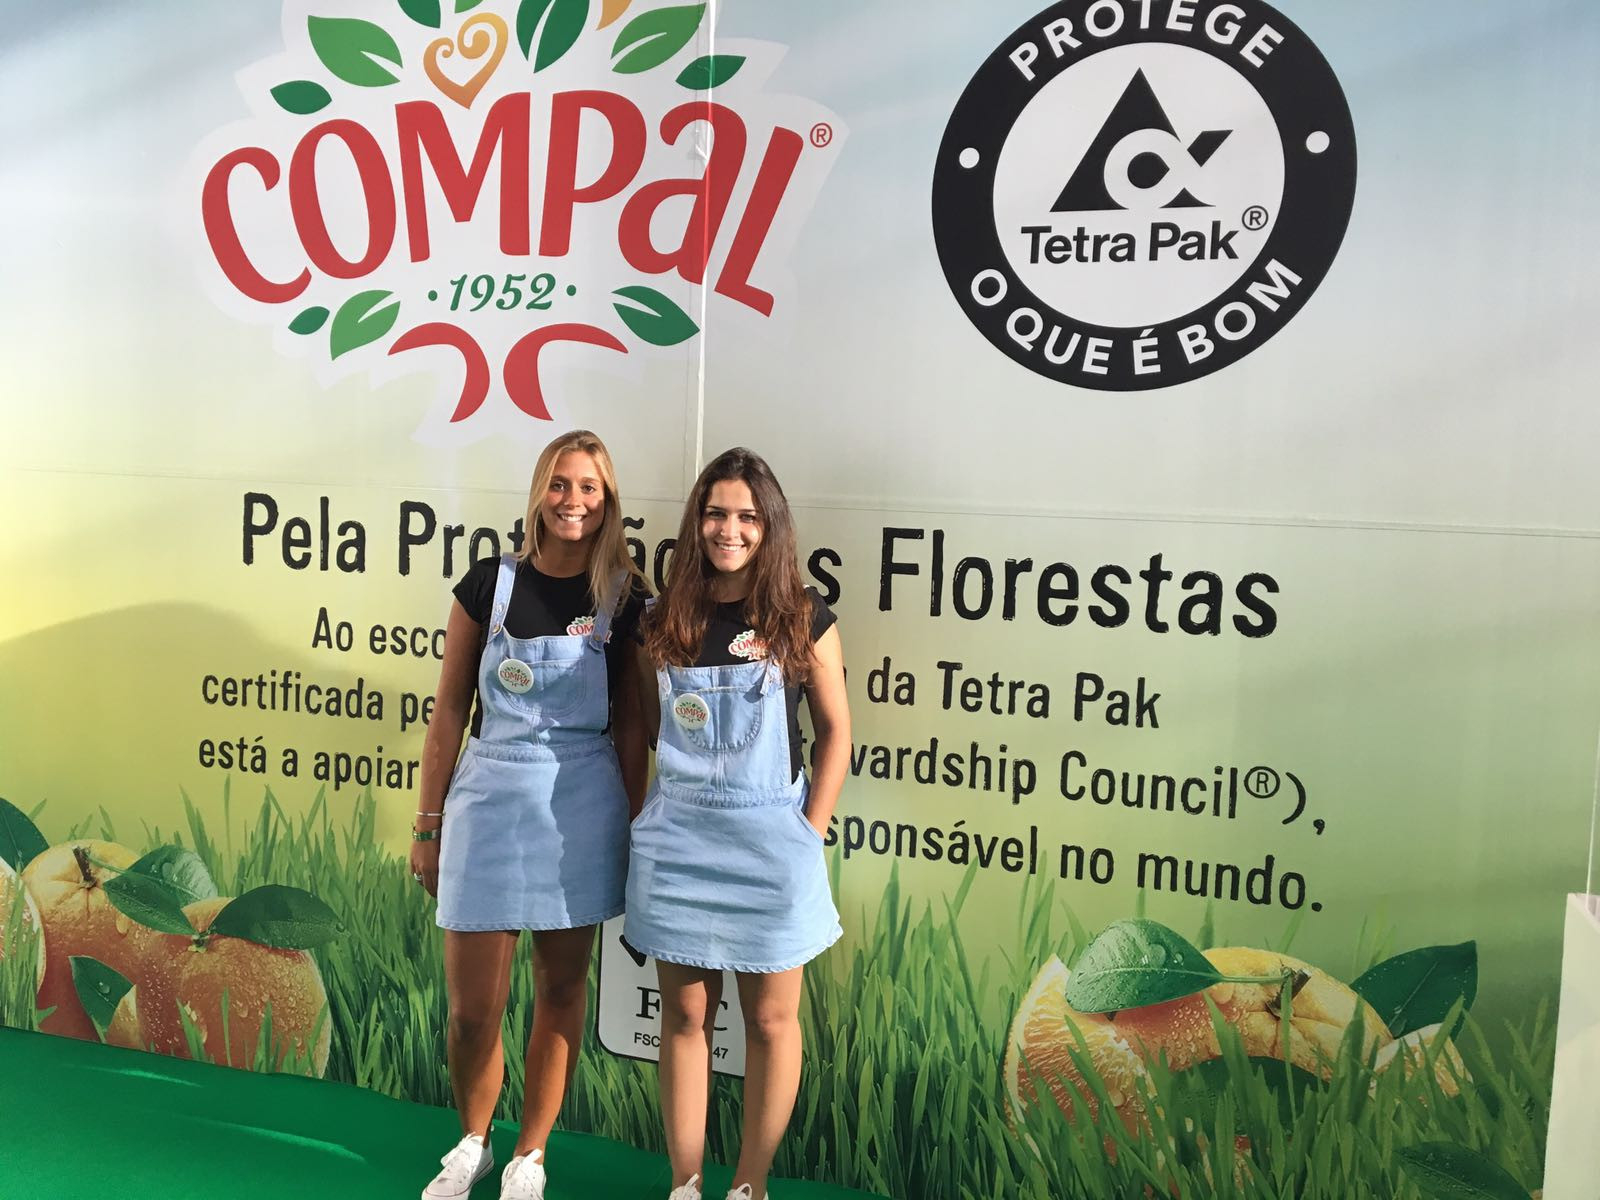 Compal - Green Fest.JPG